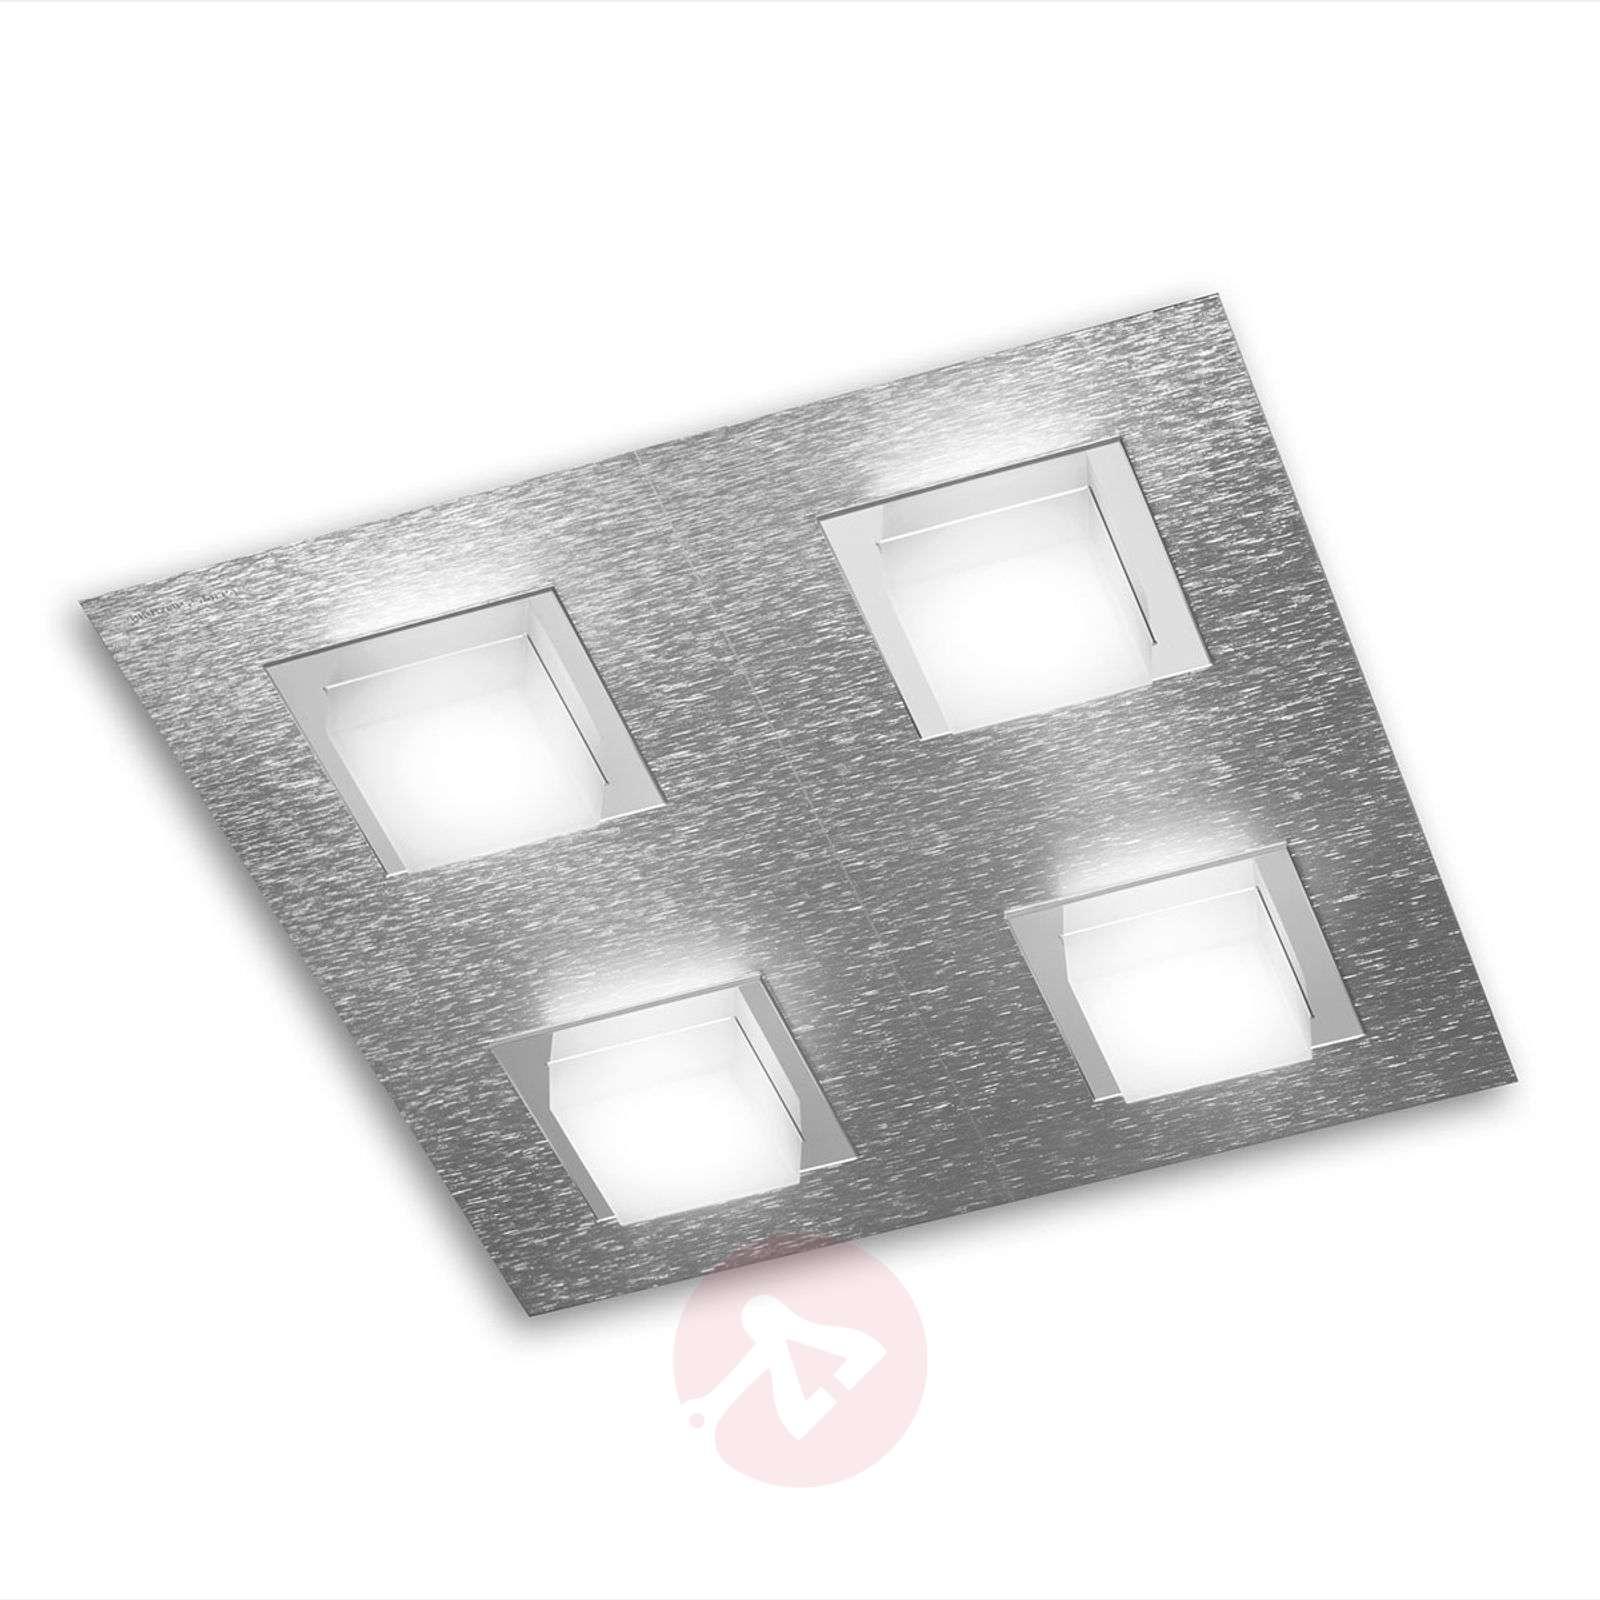 GROSSMANN Basic LED-kattovalaisin, 4-lamppuinen-4022061X-01